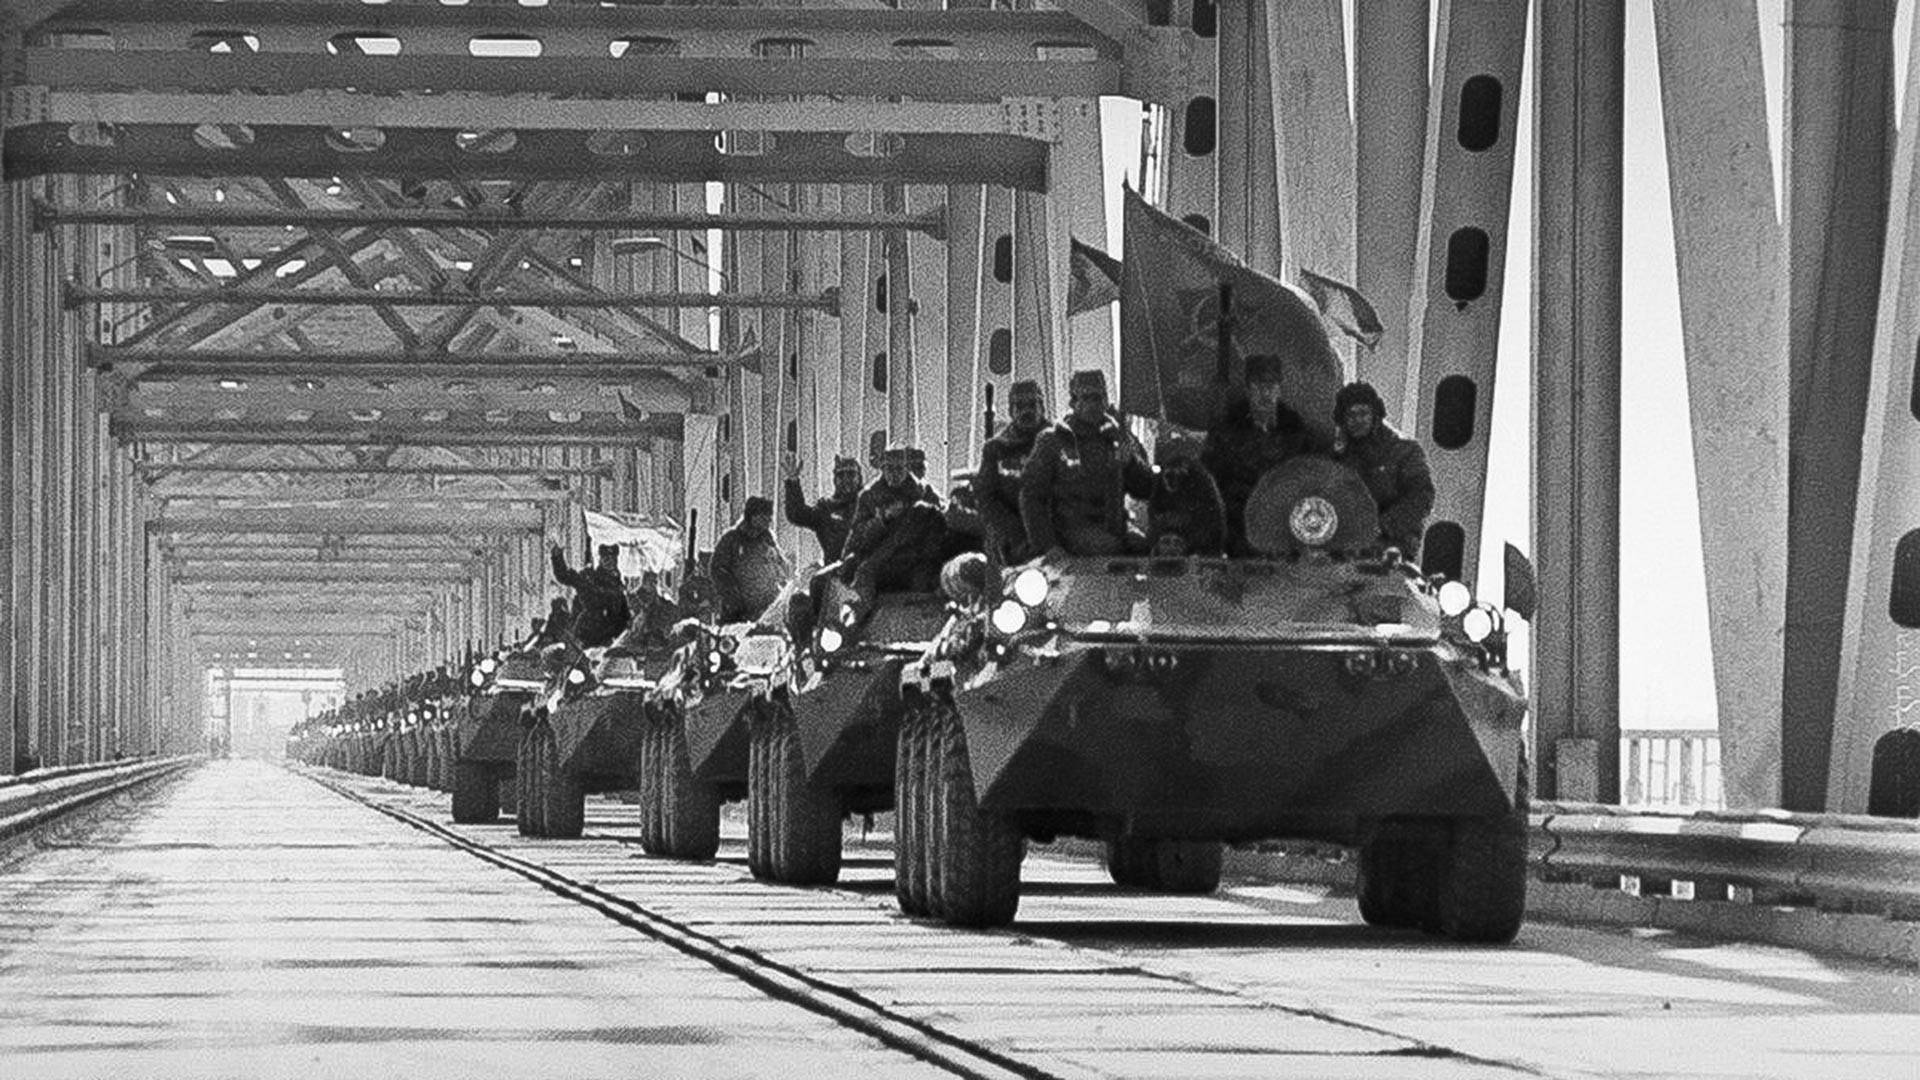 Le truppe sovietiche lasciano l'Afghanistan